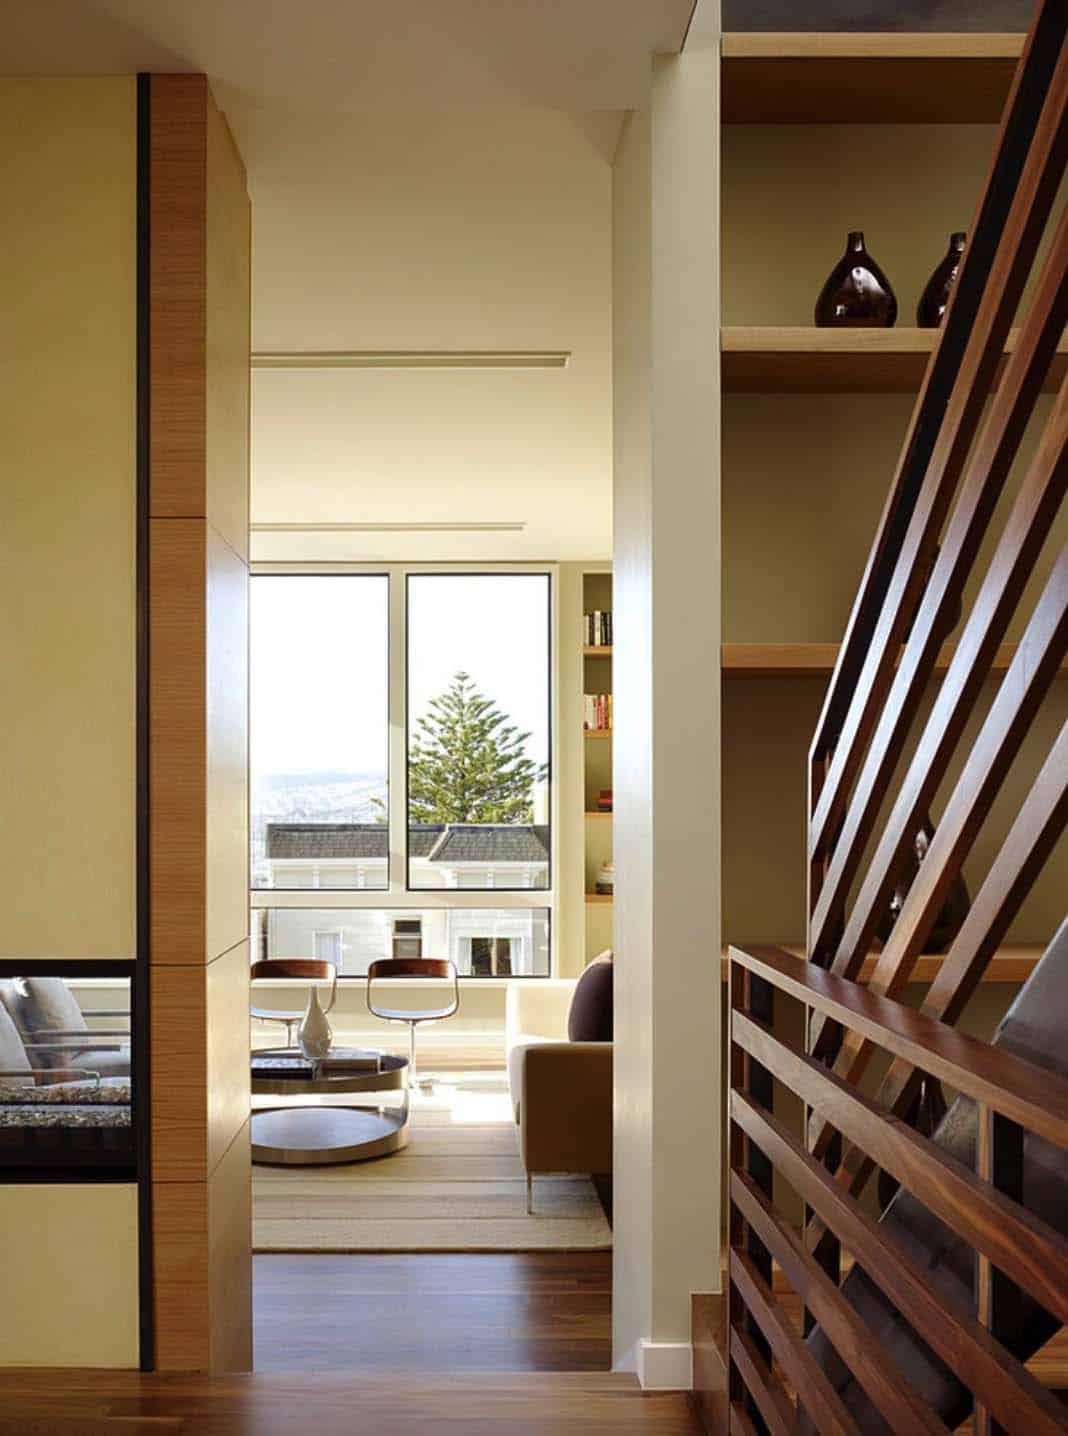 Architecture Modern Hillside Home-05-1 Kindesign